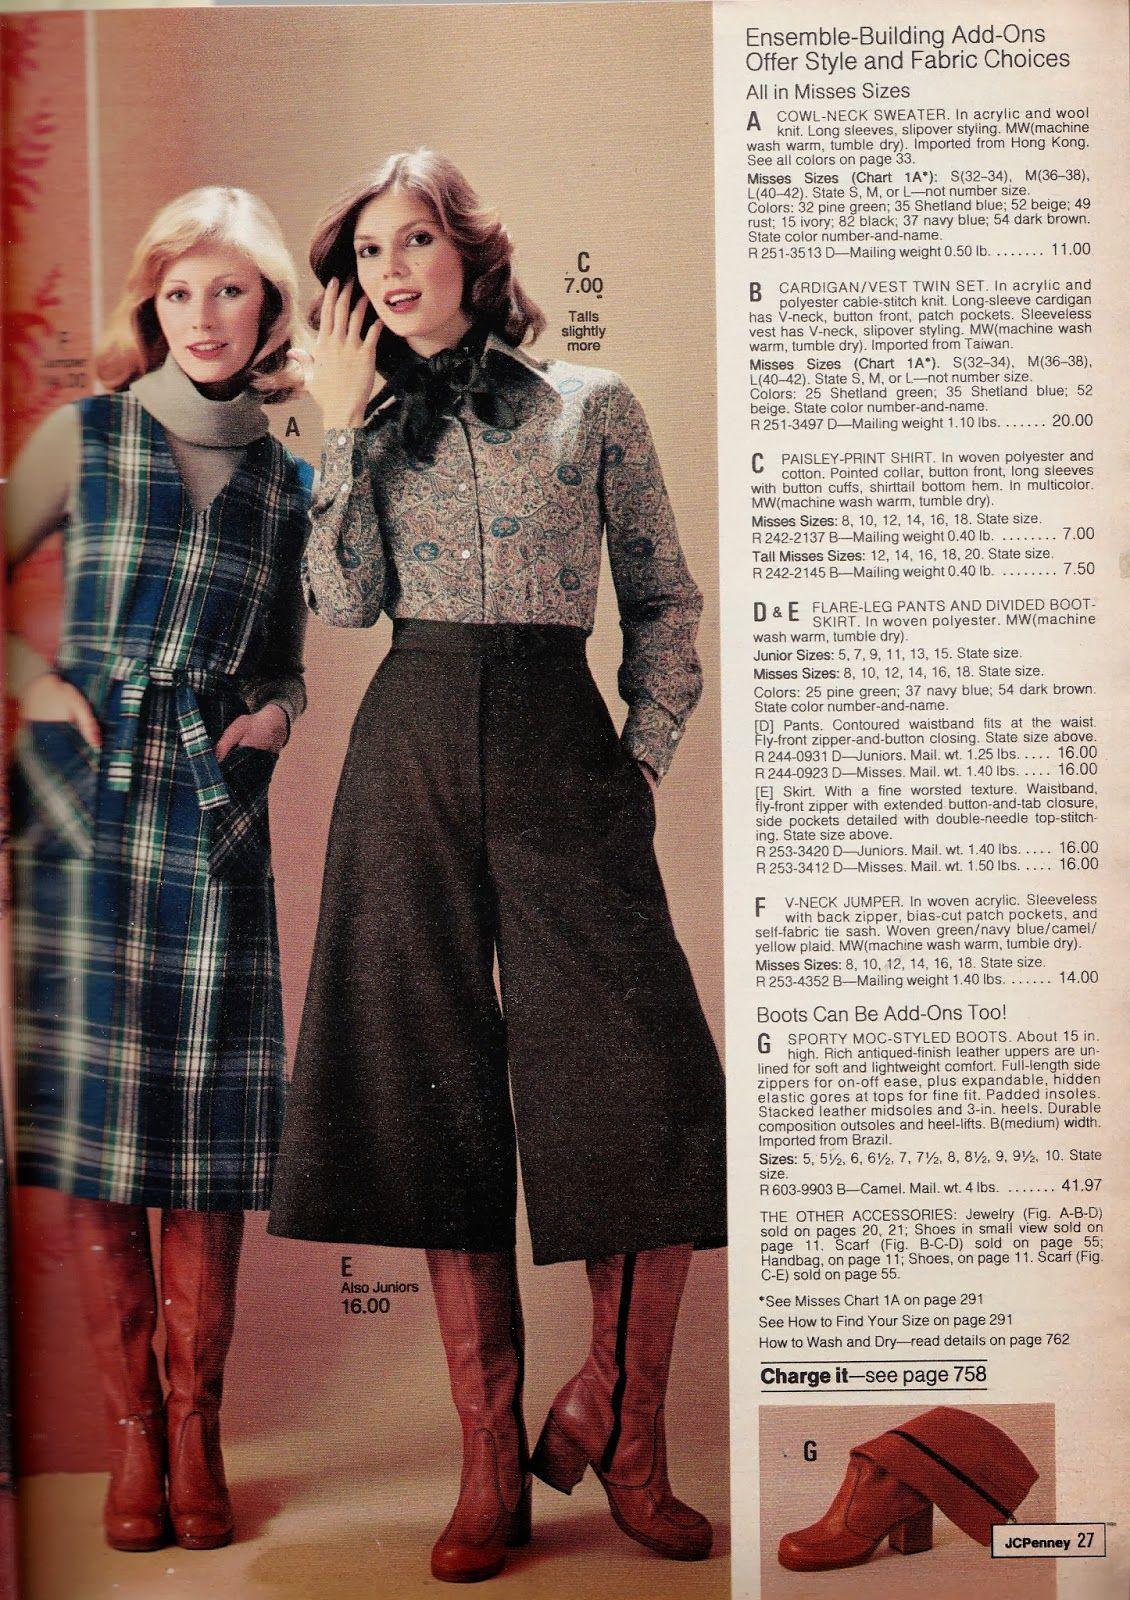 Kathy Loghry Blogspot: Random Weirdness: 70s Gauchos - Part 1